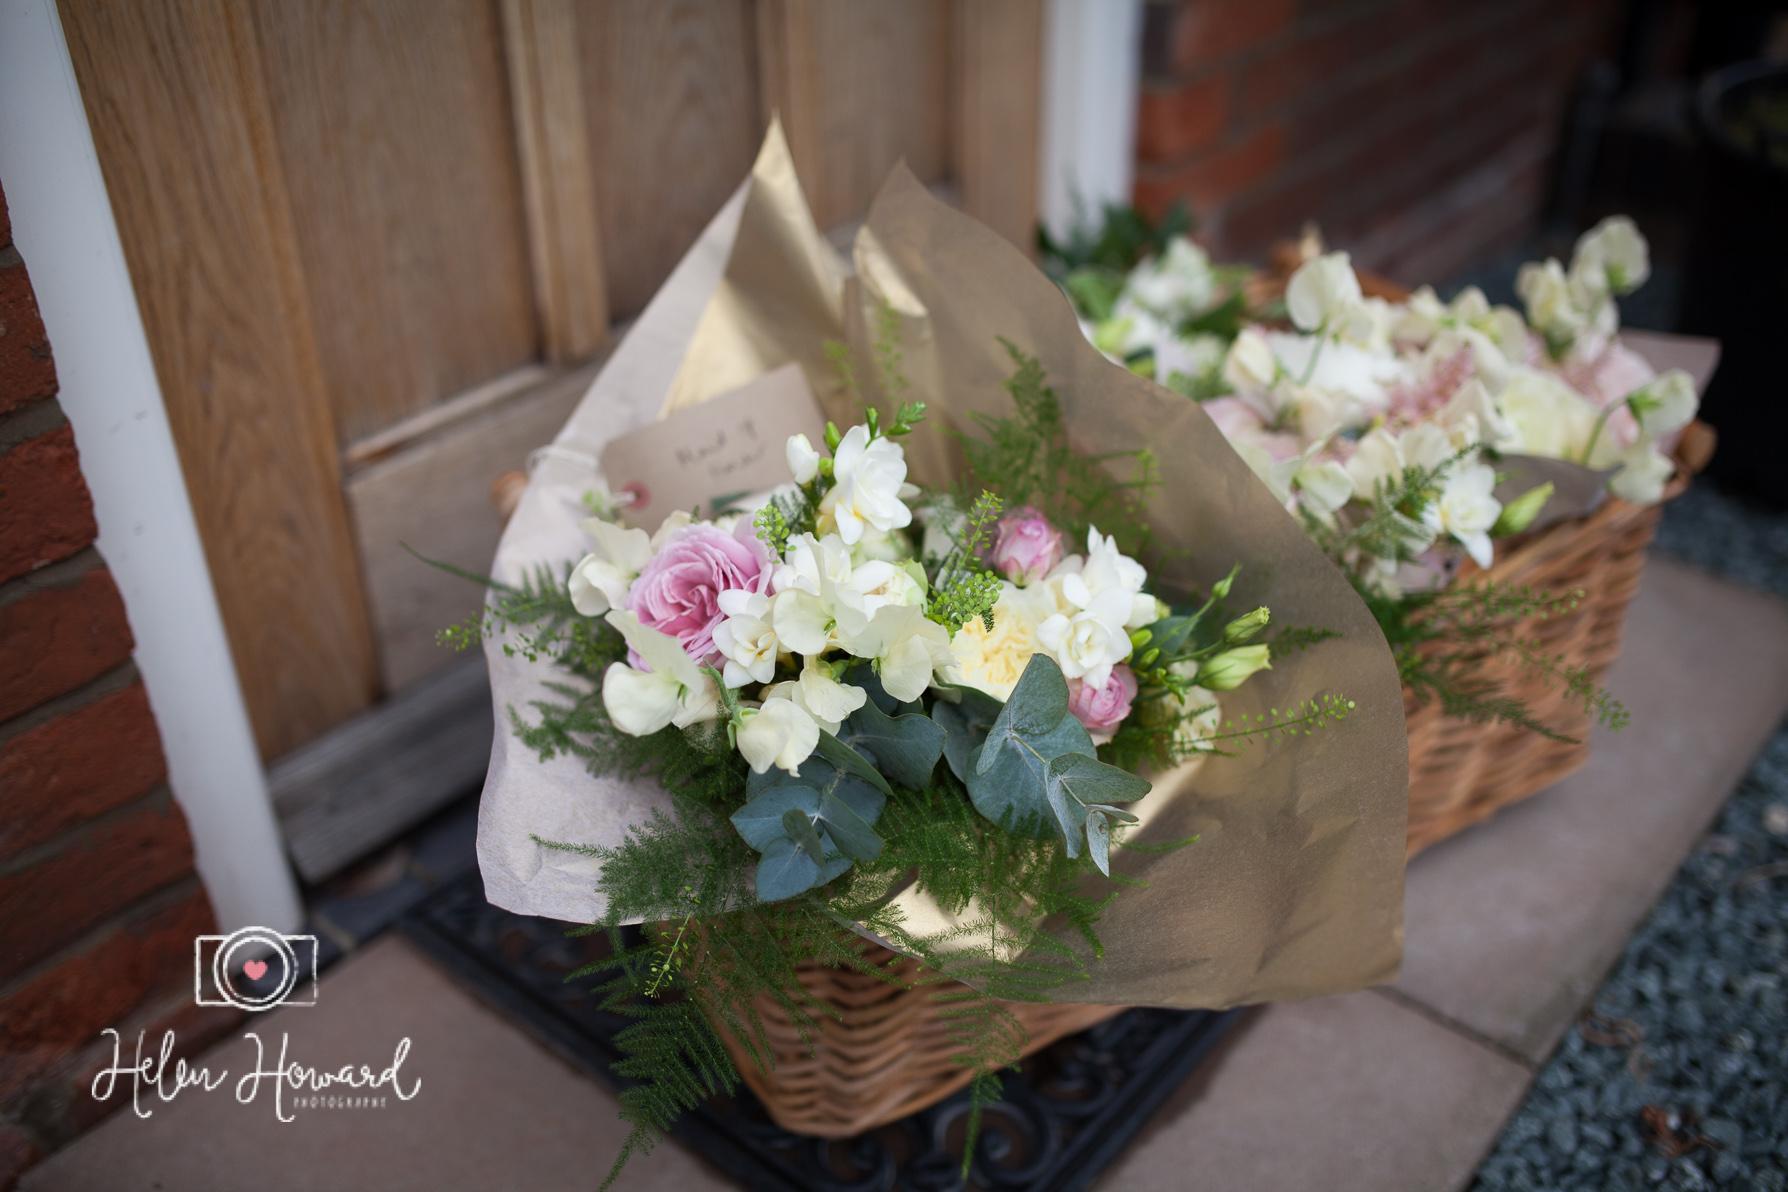 Helen Howard Photography Packington Moor Wedding-32.jpg